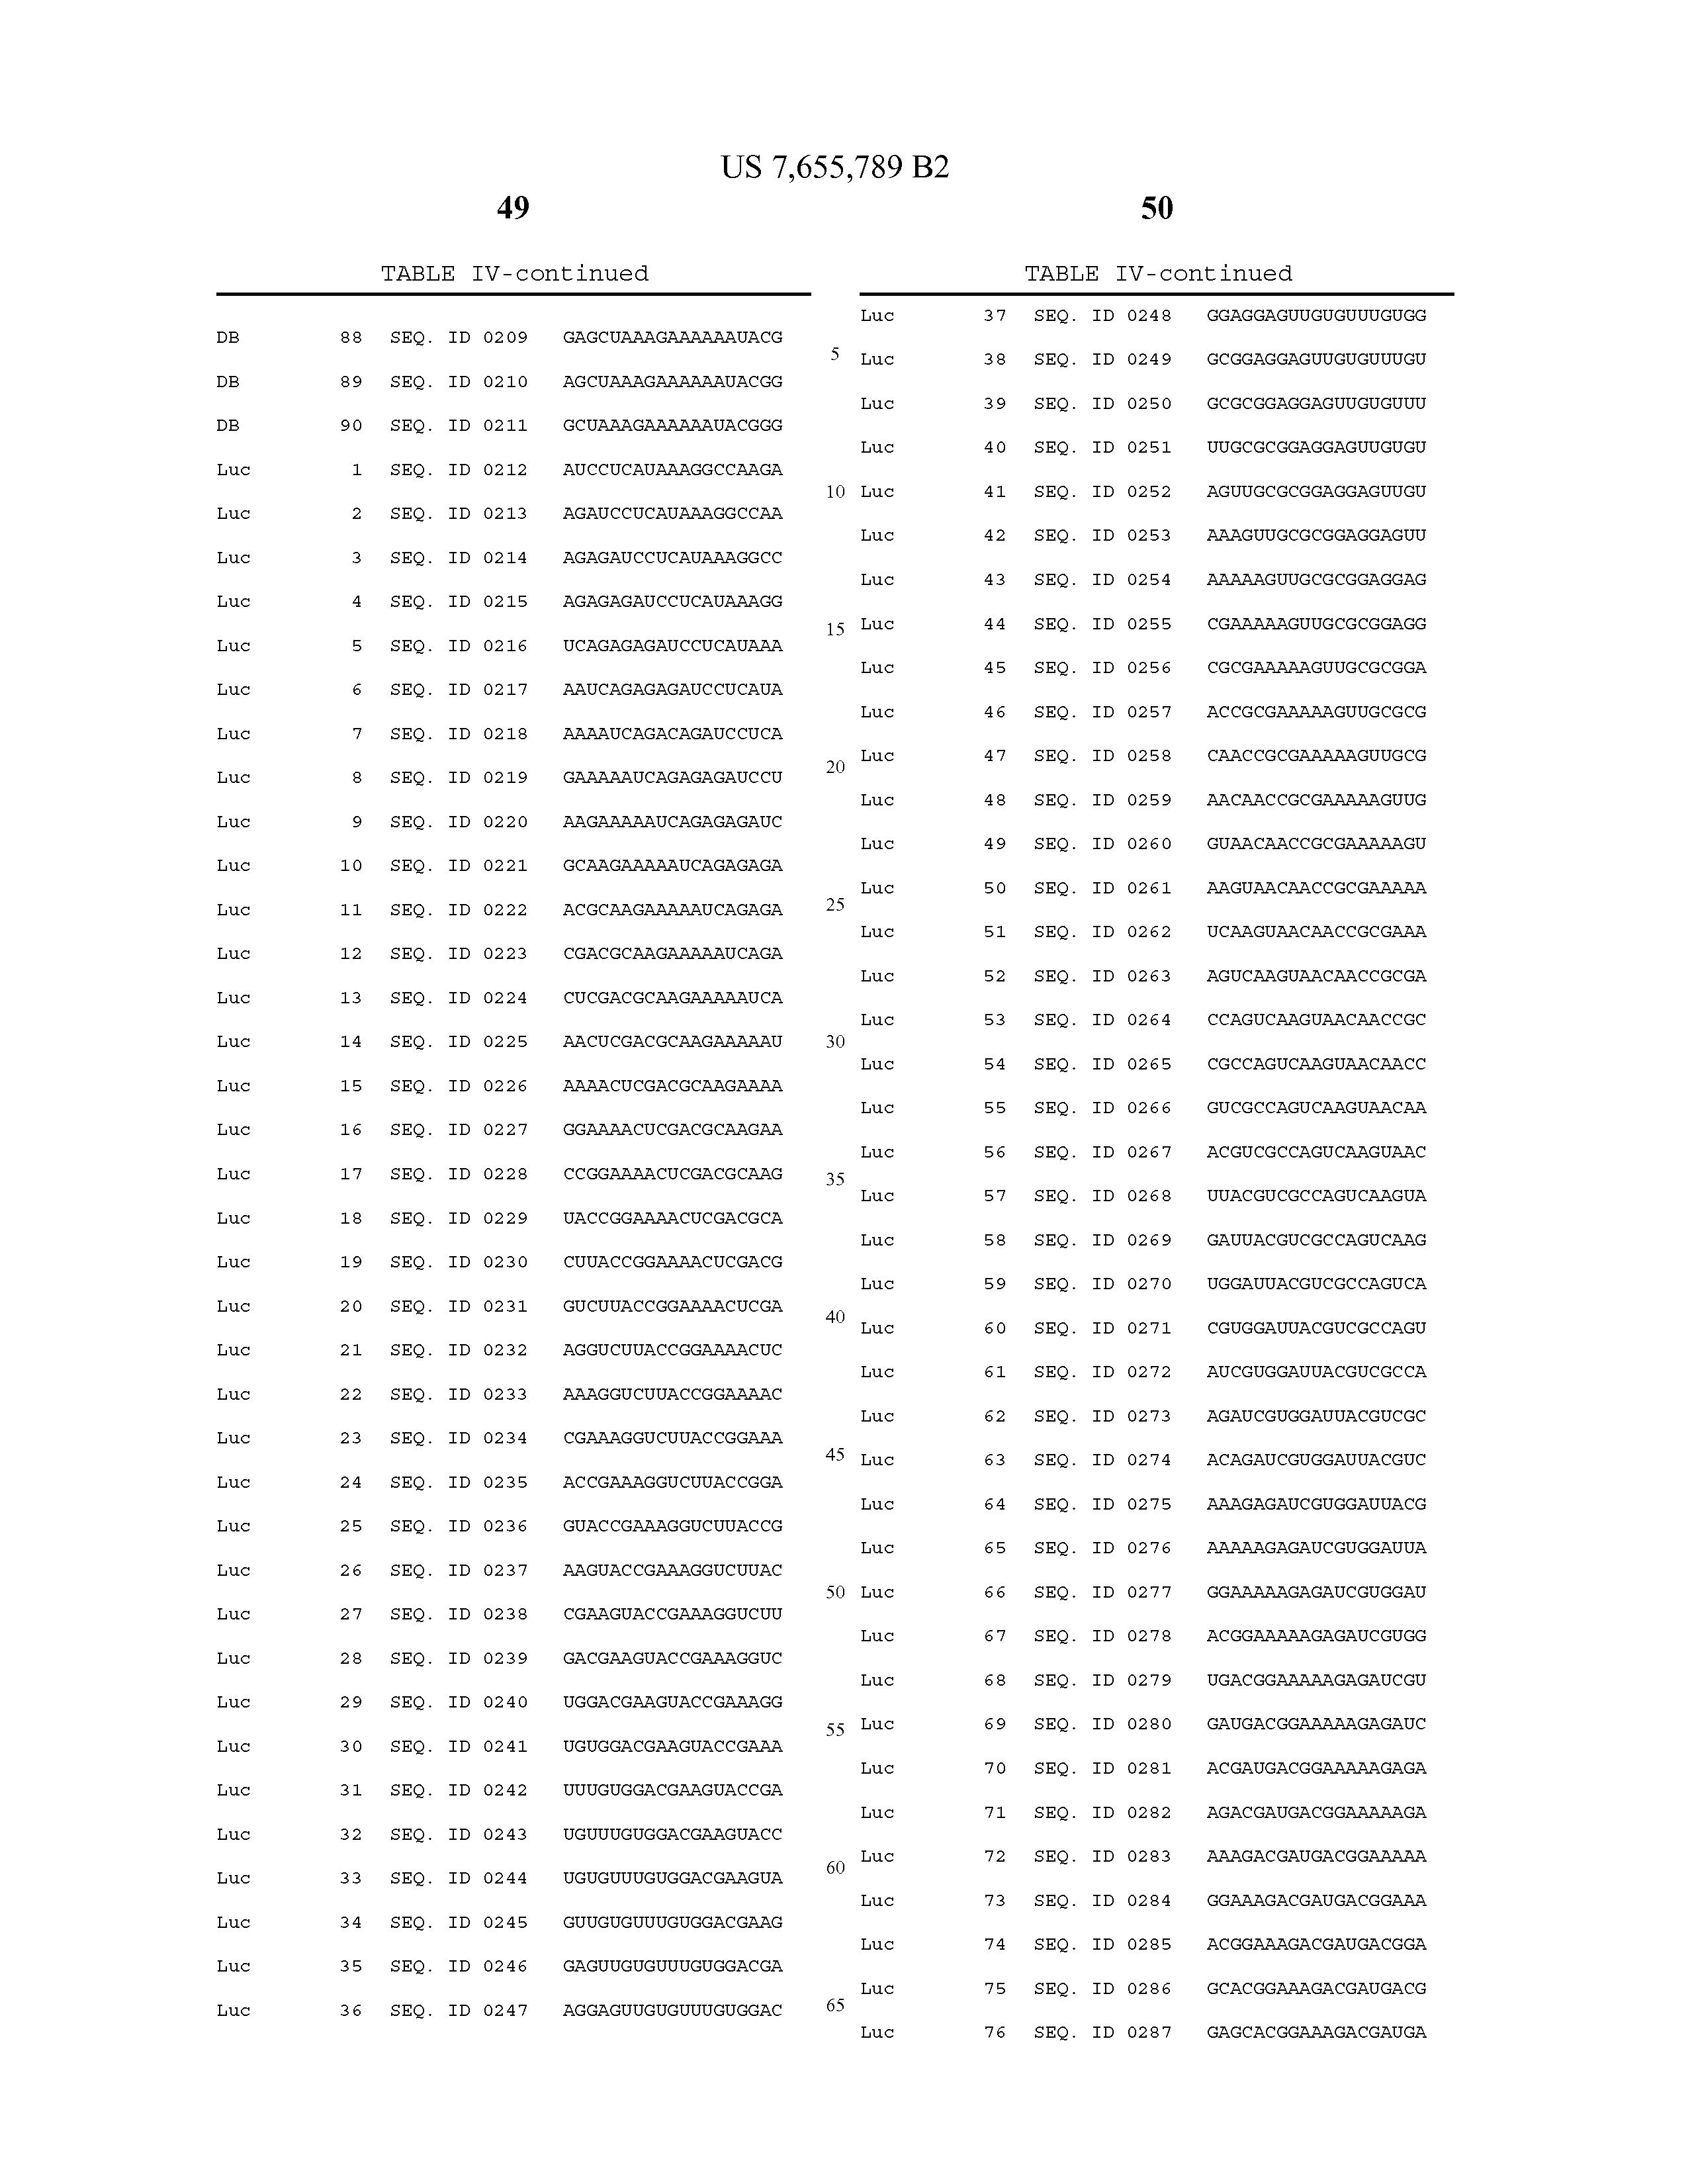 US 7655789 B2 - Sirna Targeting Transient Receptor Potential